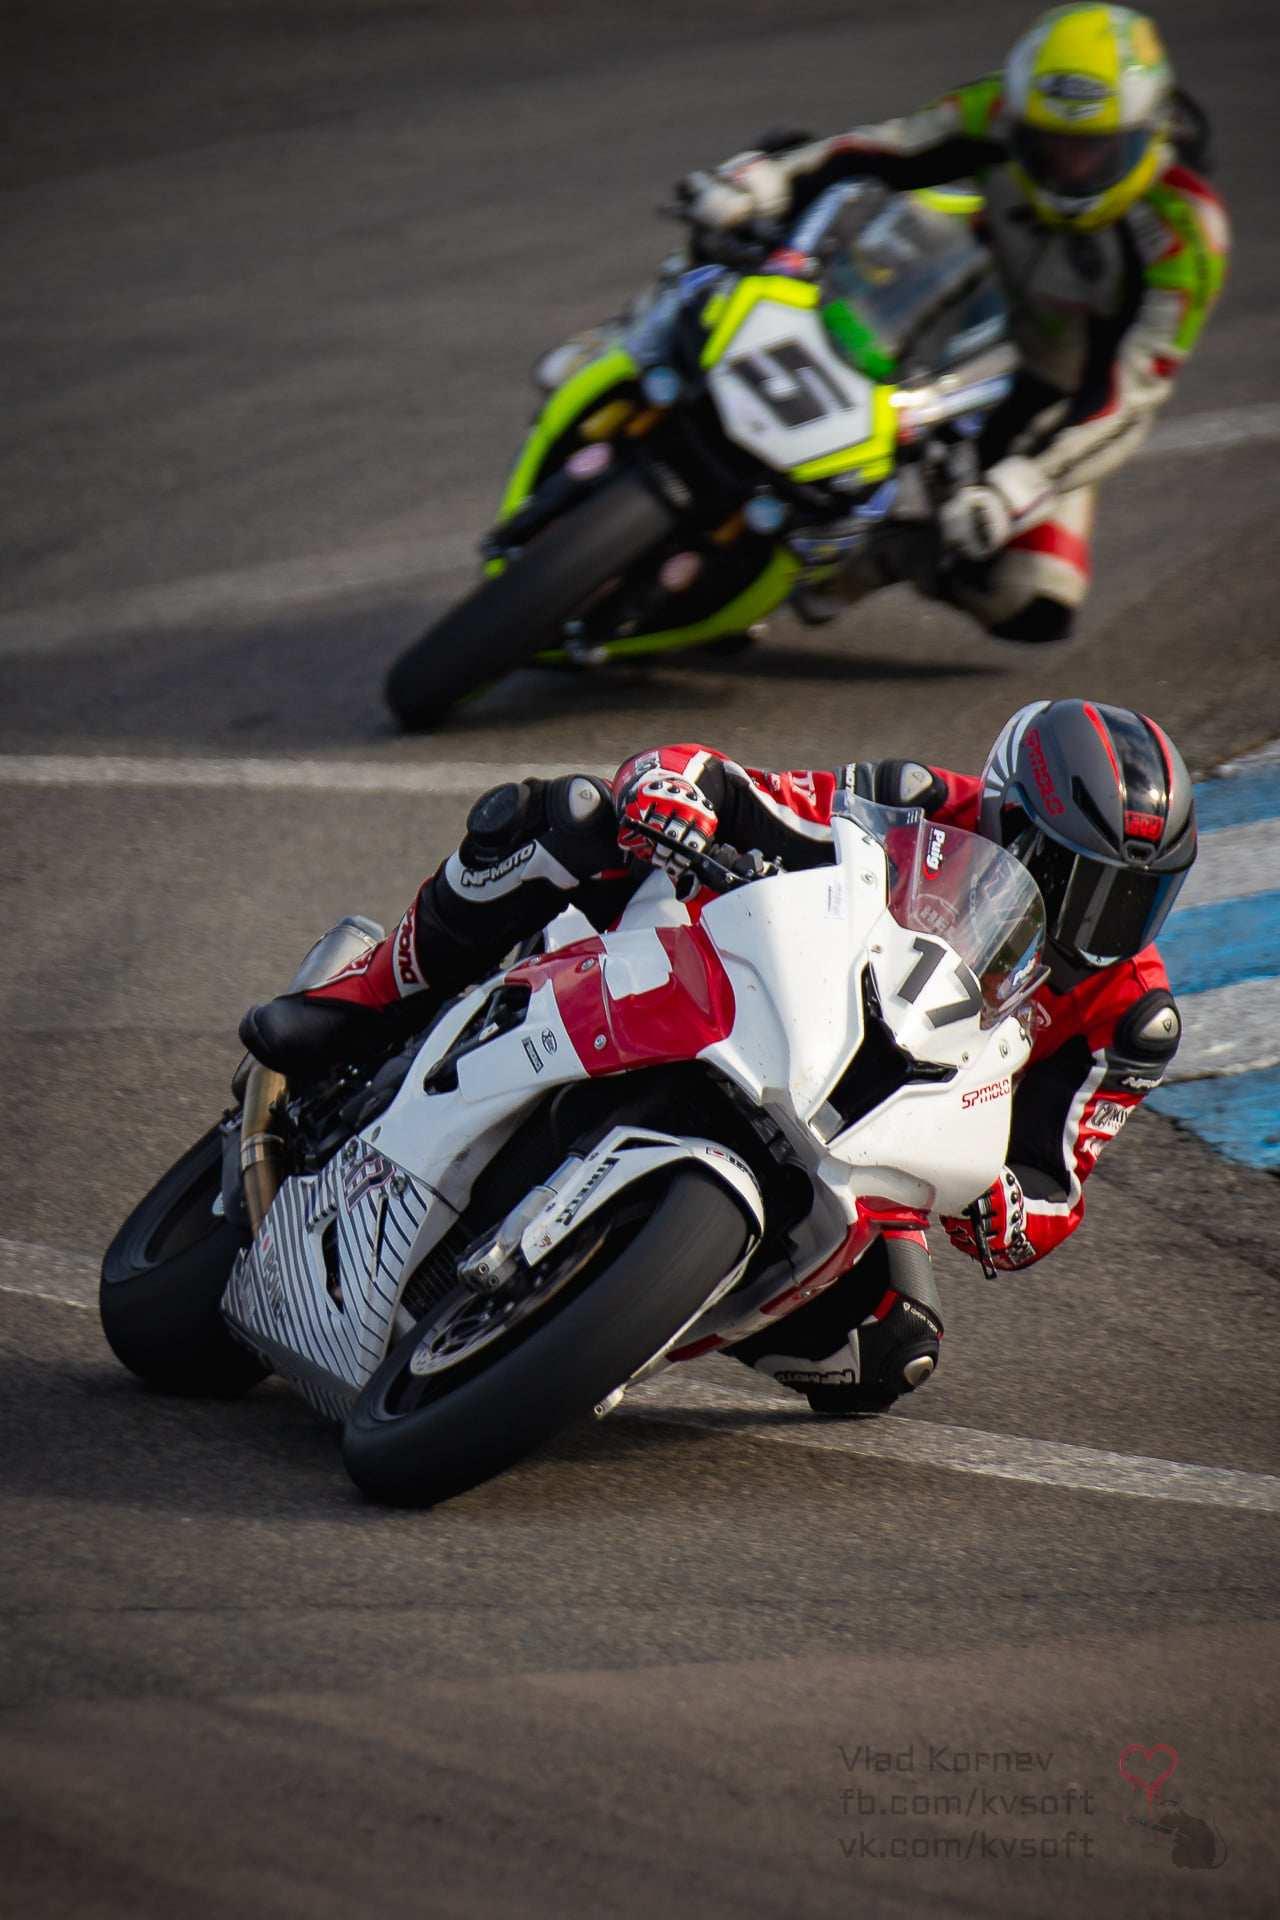 5-6_etap_MotoGPUkraine_052